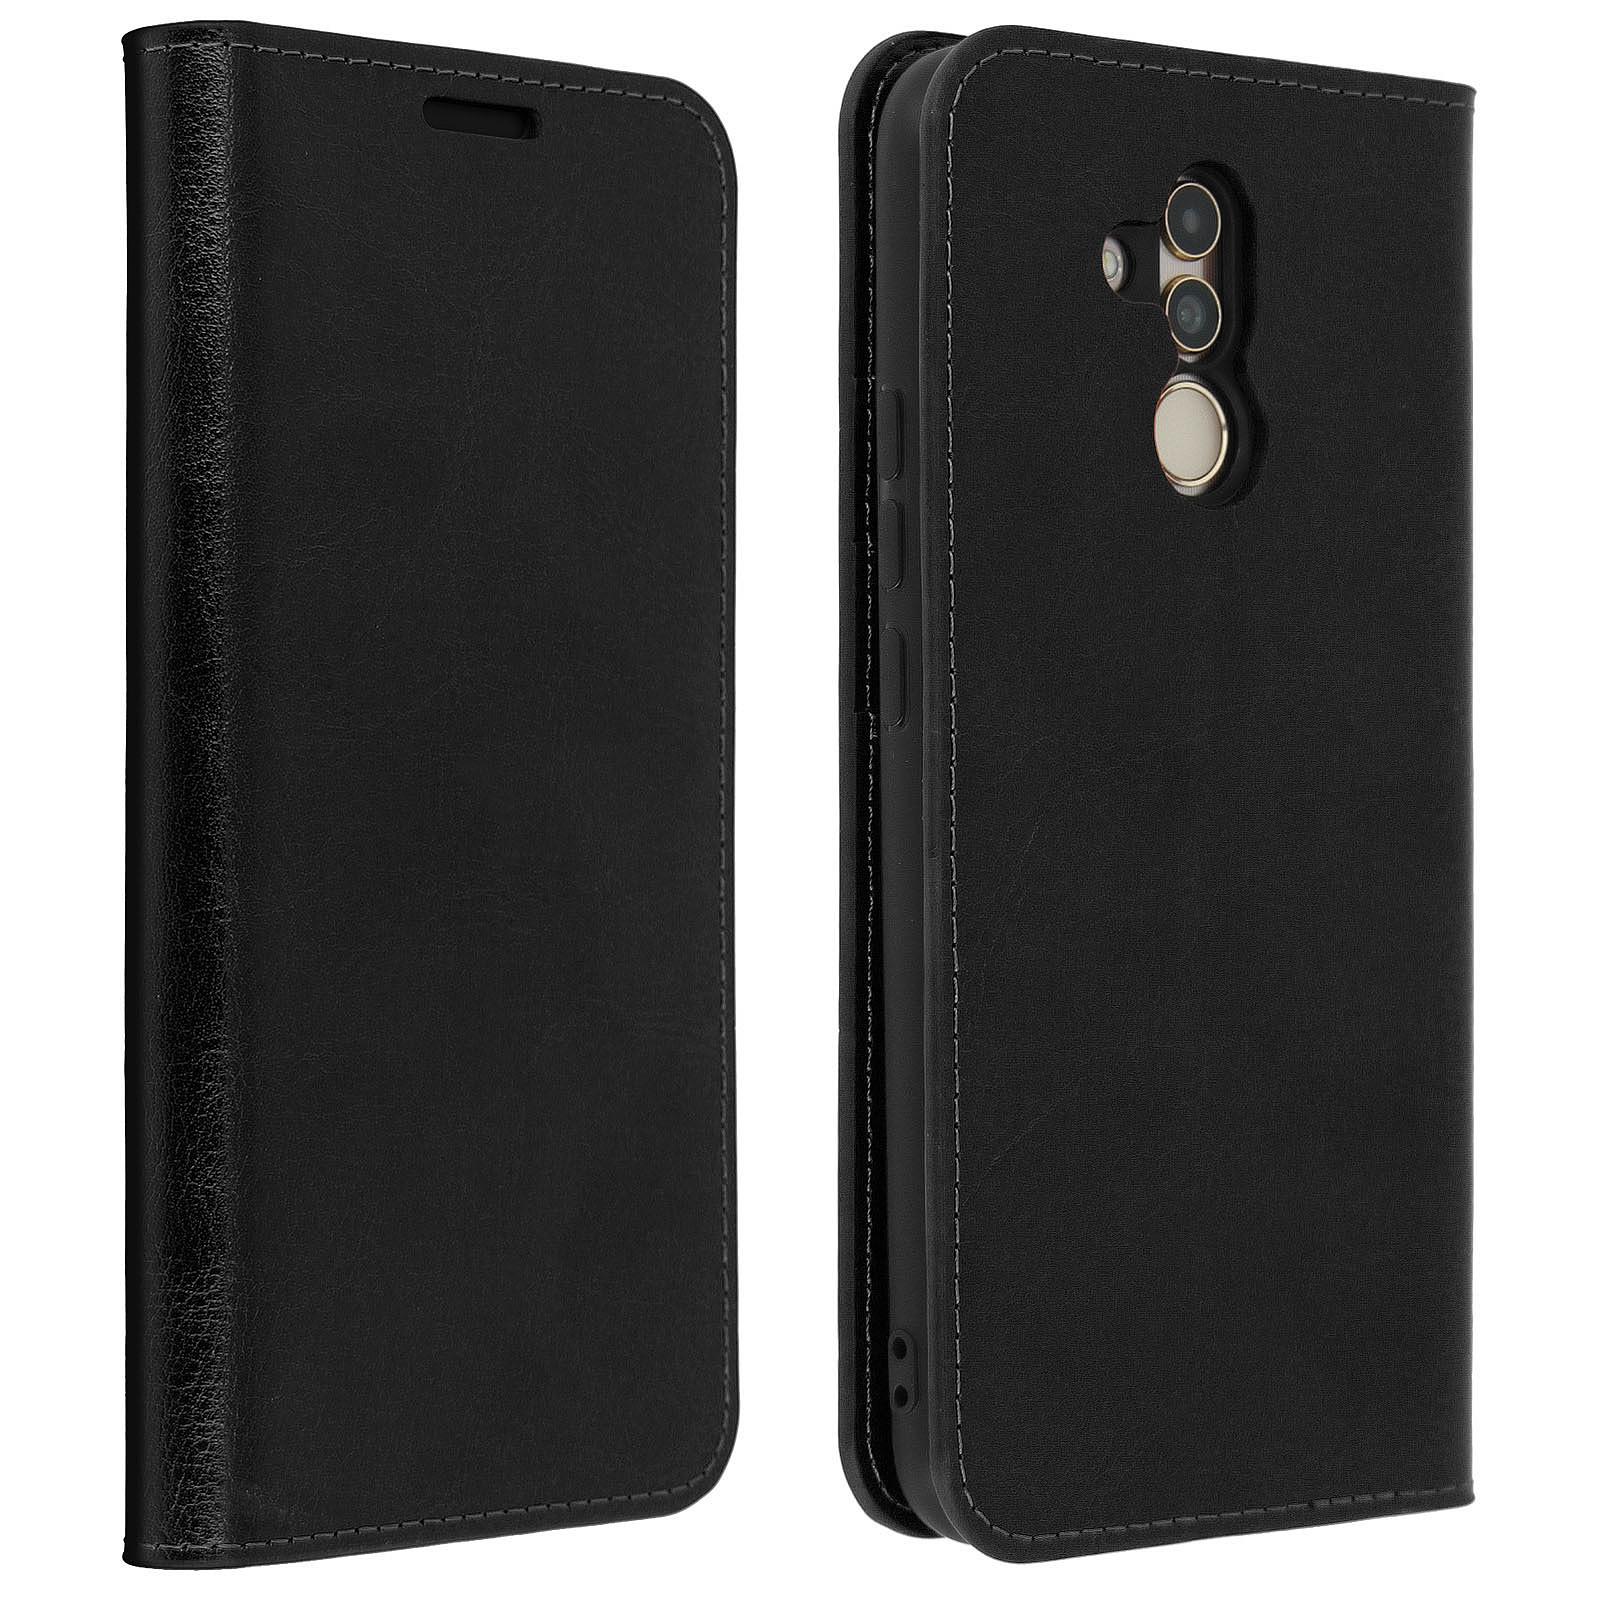 Avizar Etui folio Noir Cuir véritable pour Huawei Mate 20 Lite